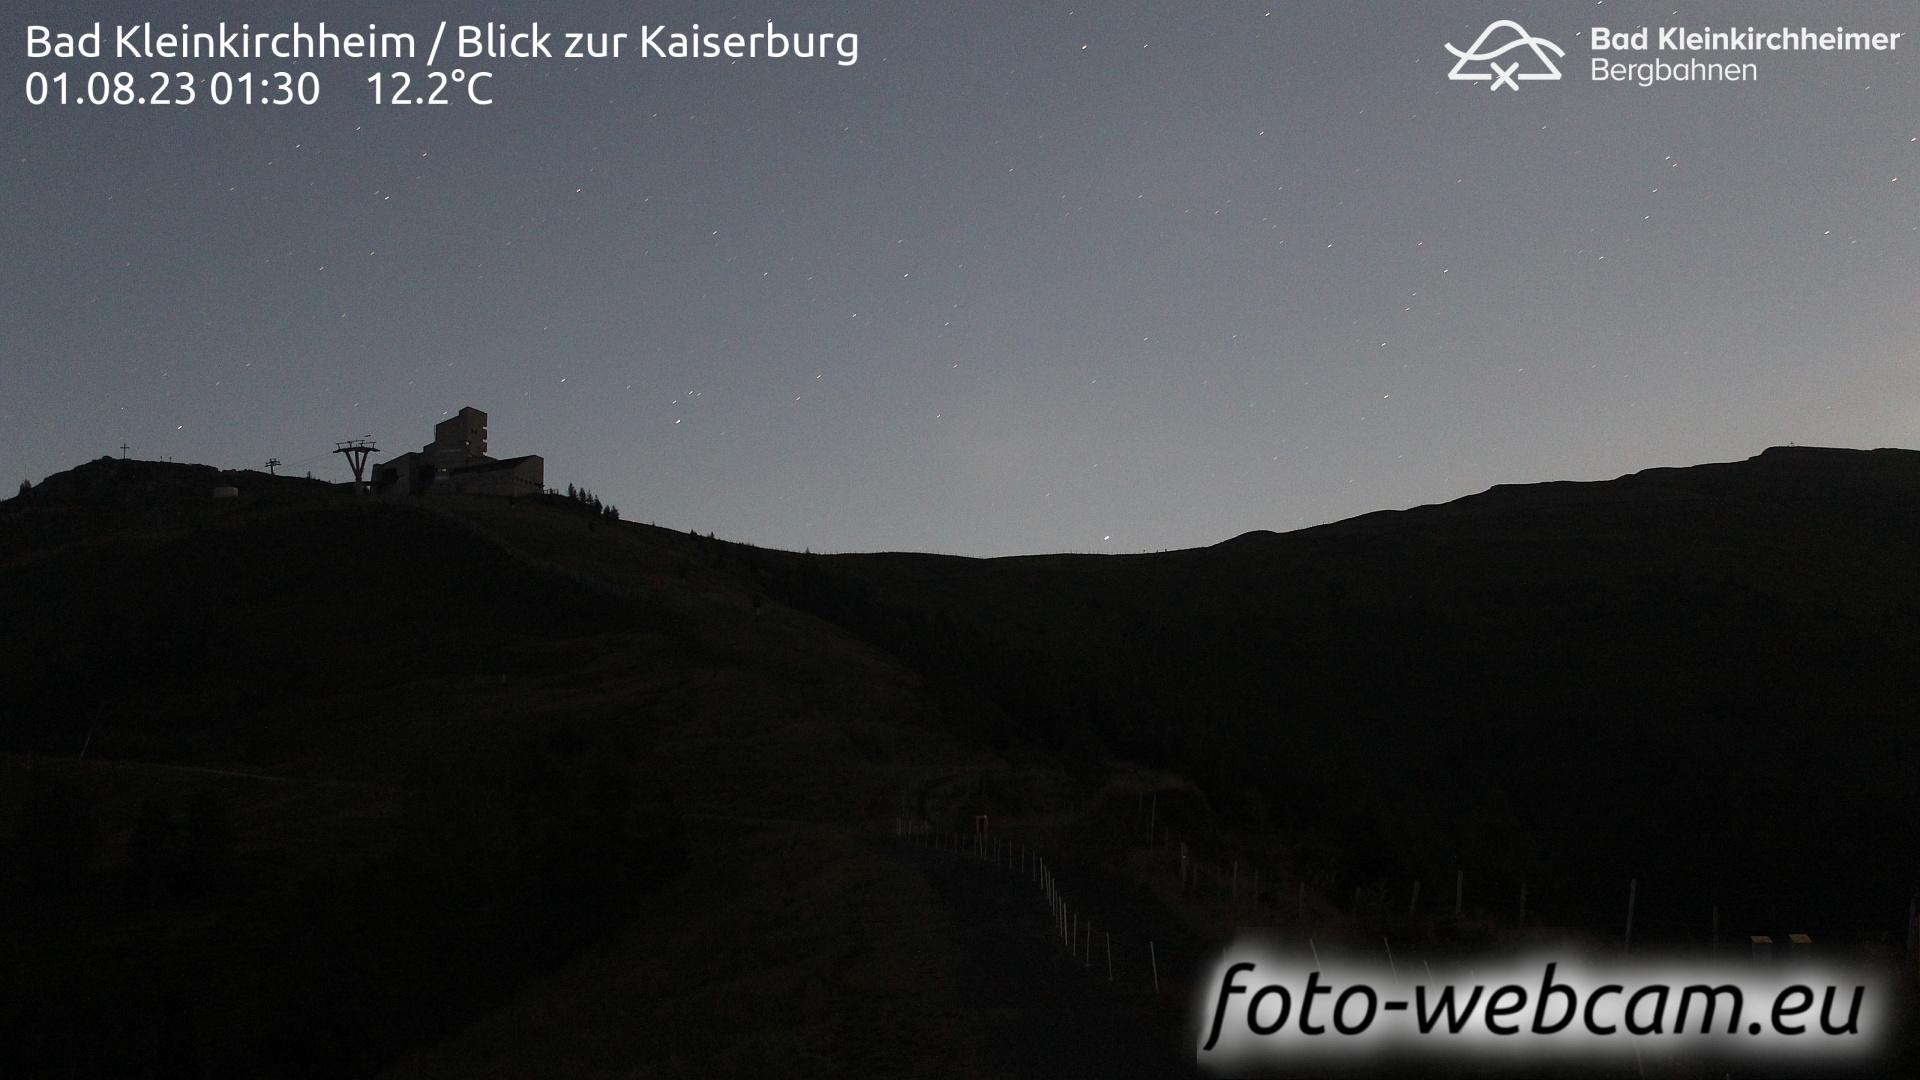 Bad Kleinkirchheim Thu. 01:23